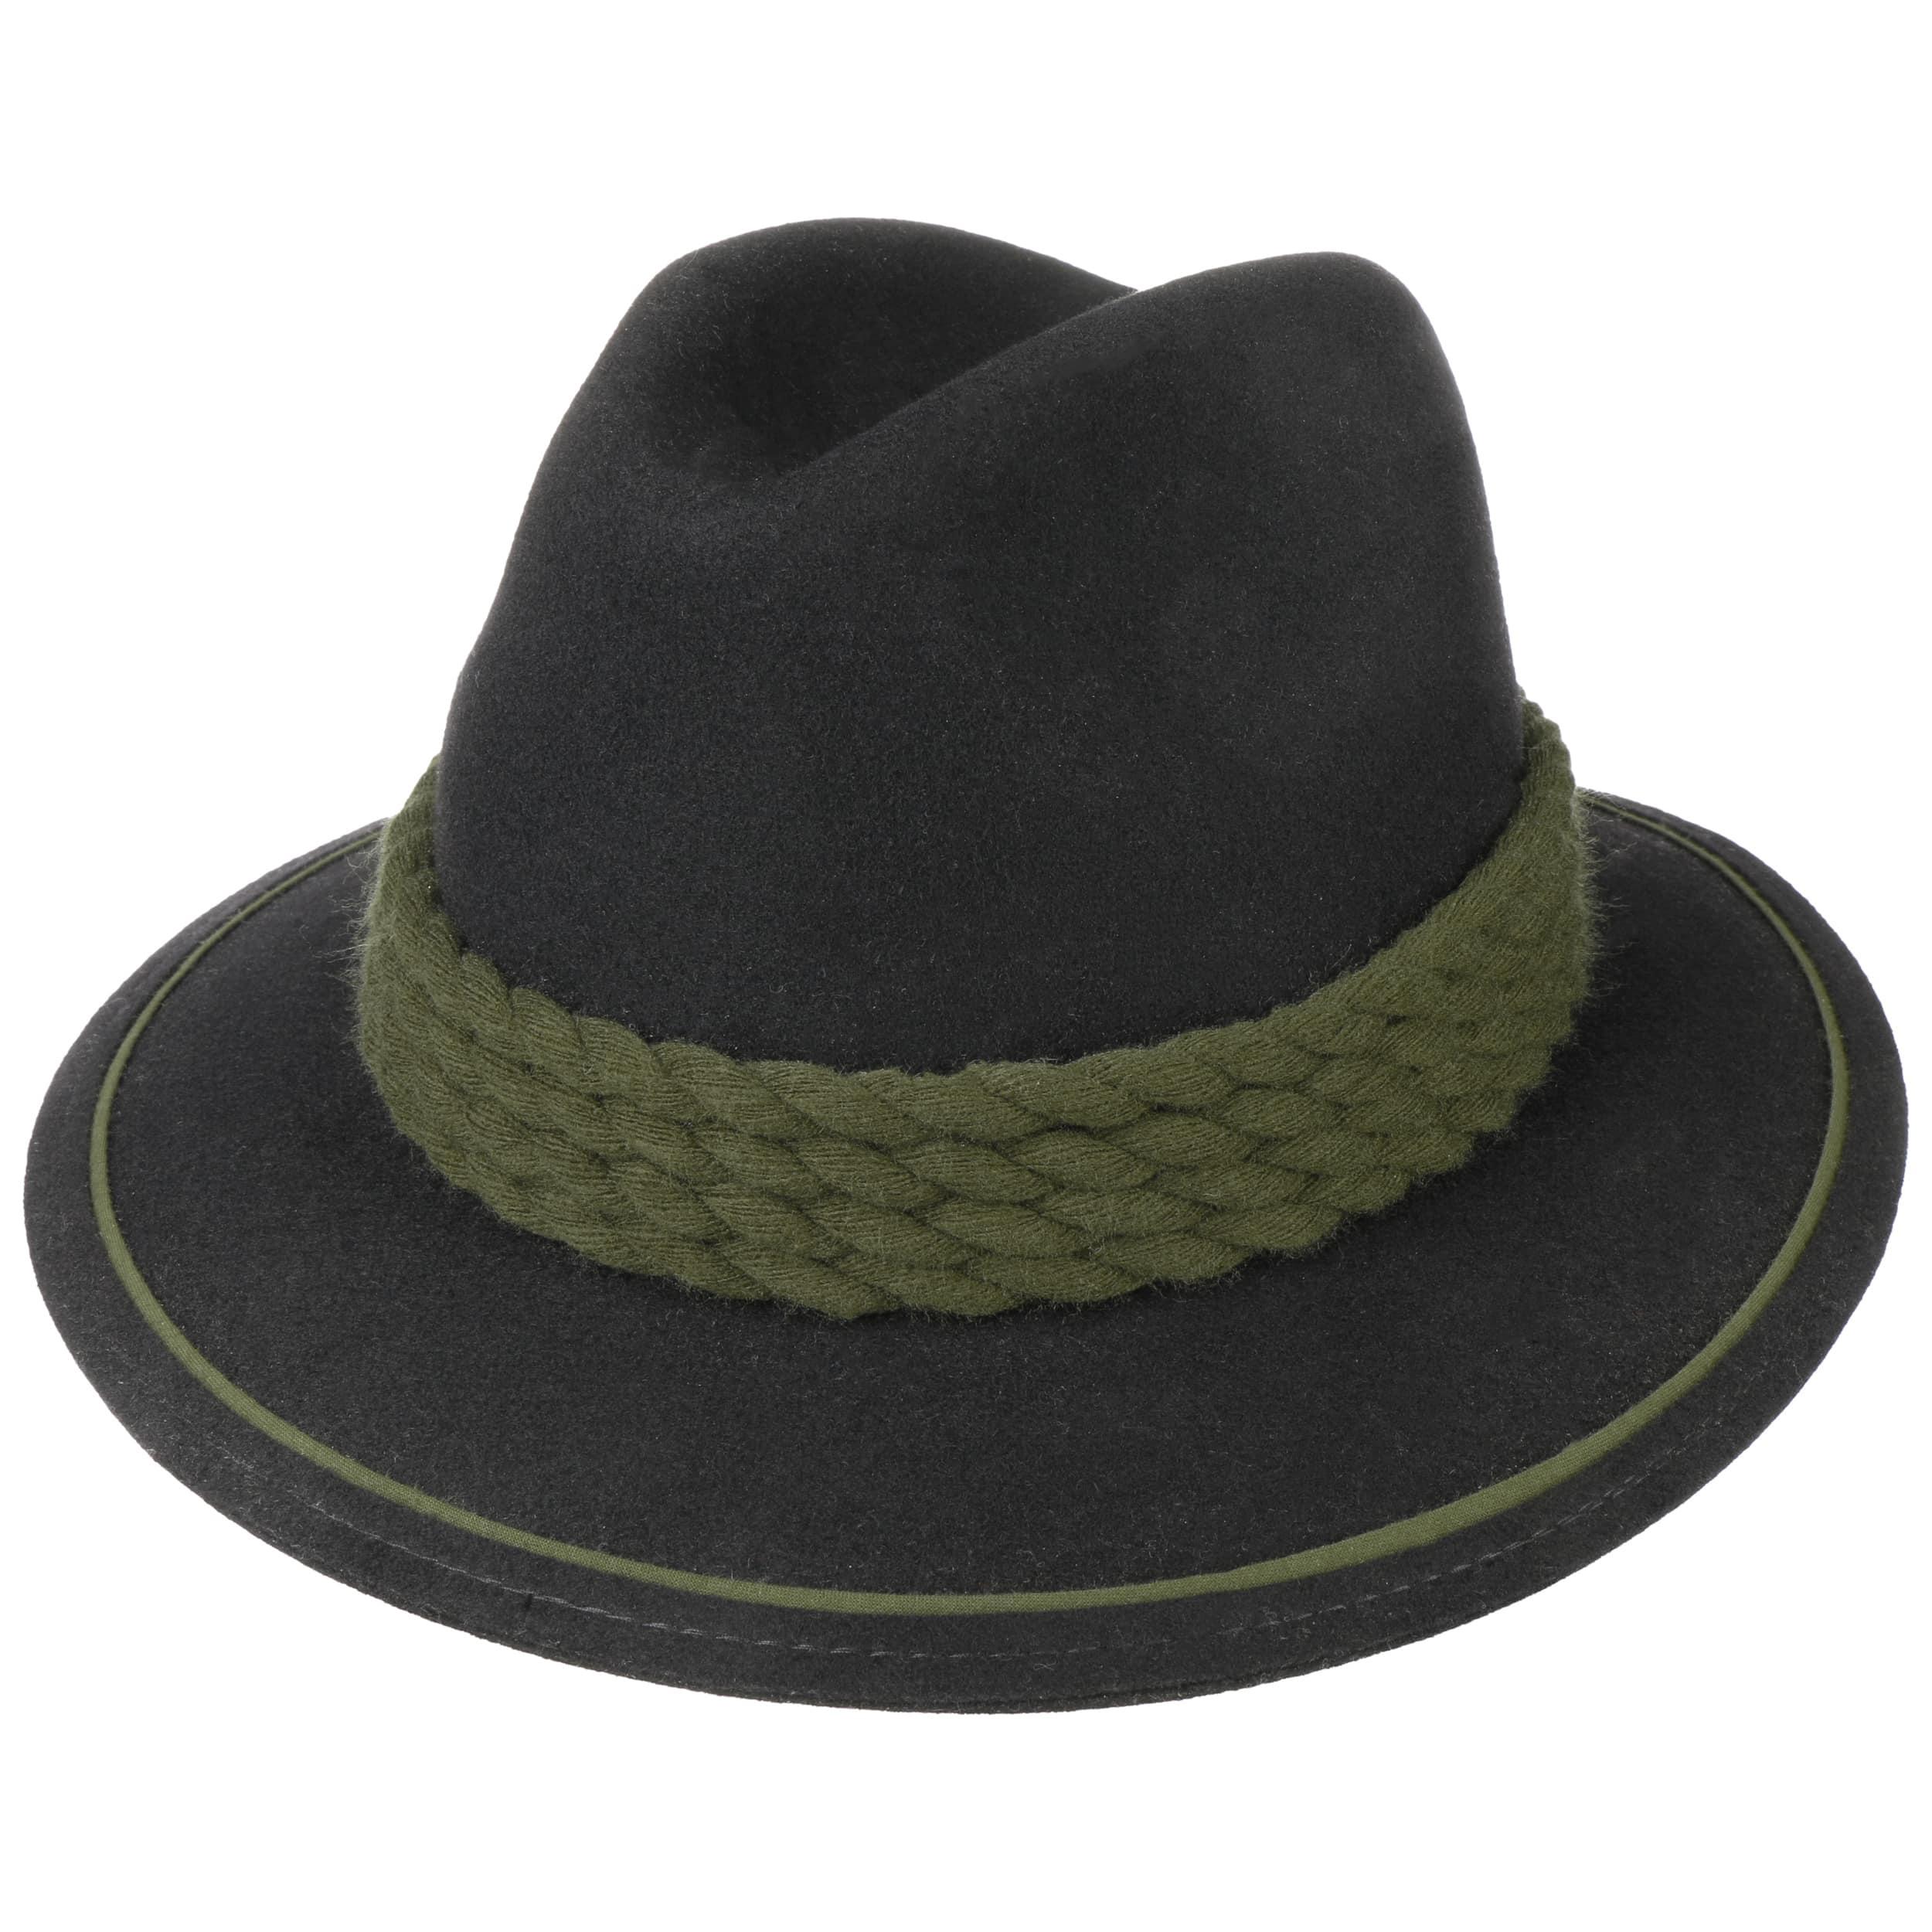 NUOVO Cappello Feltro Tirolese